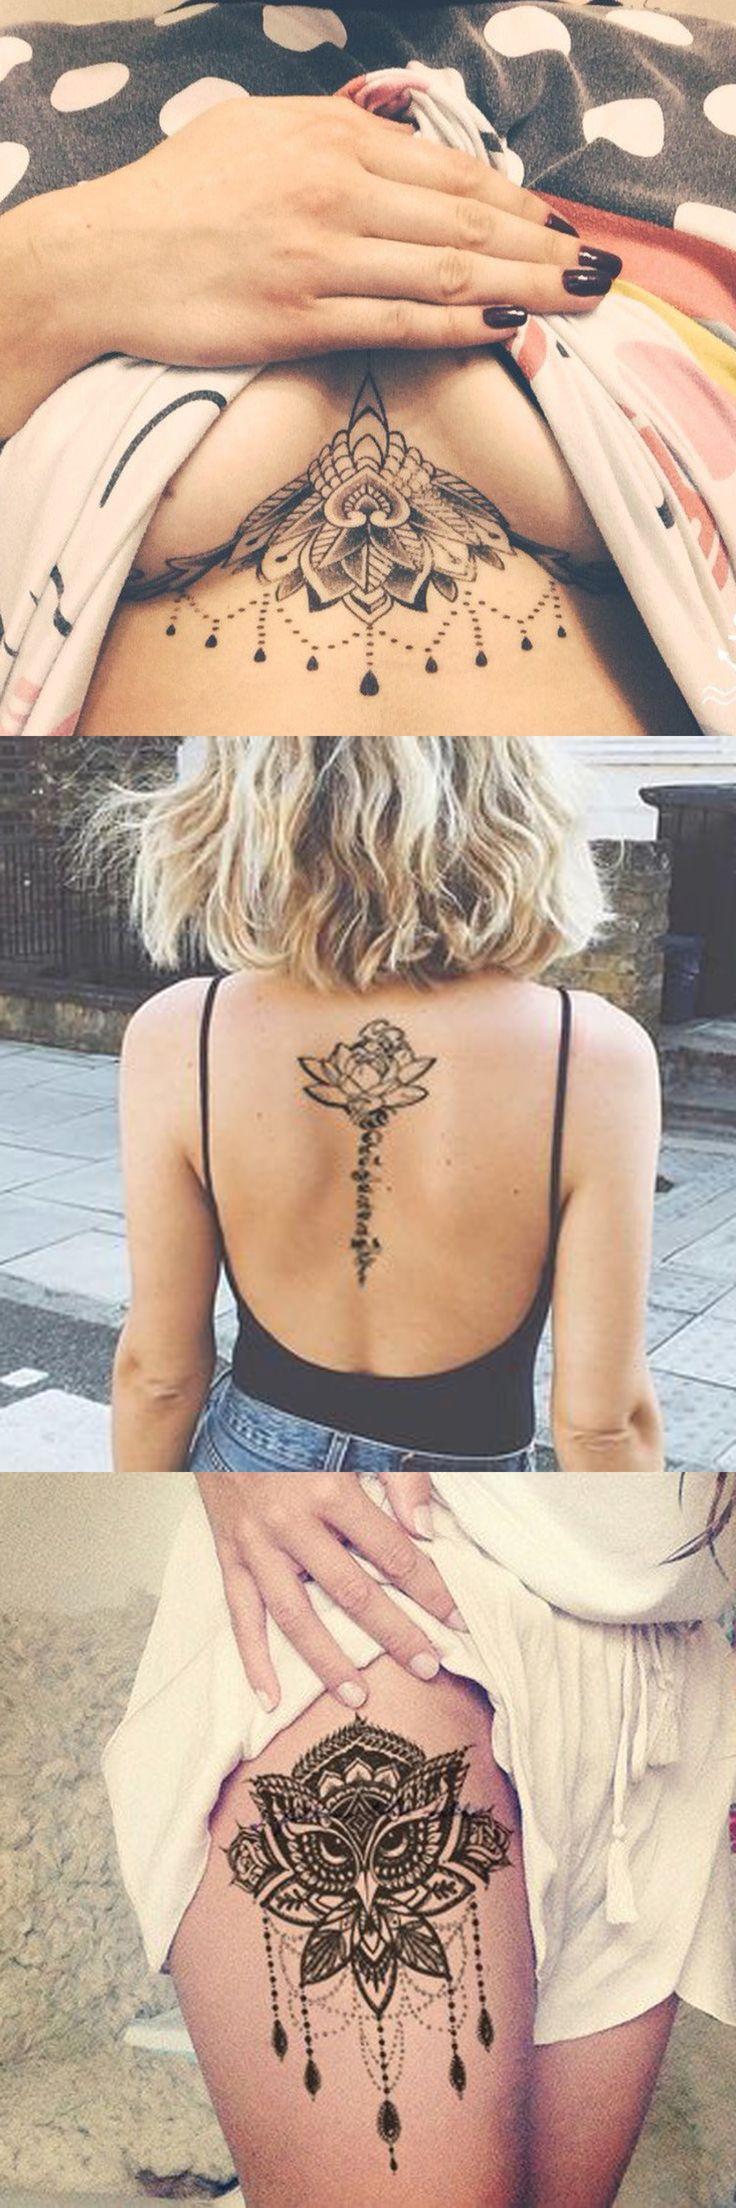 Best 25+ Women sternum tattoo ideas on Pinterest | Underboob ...